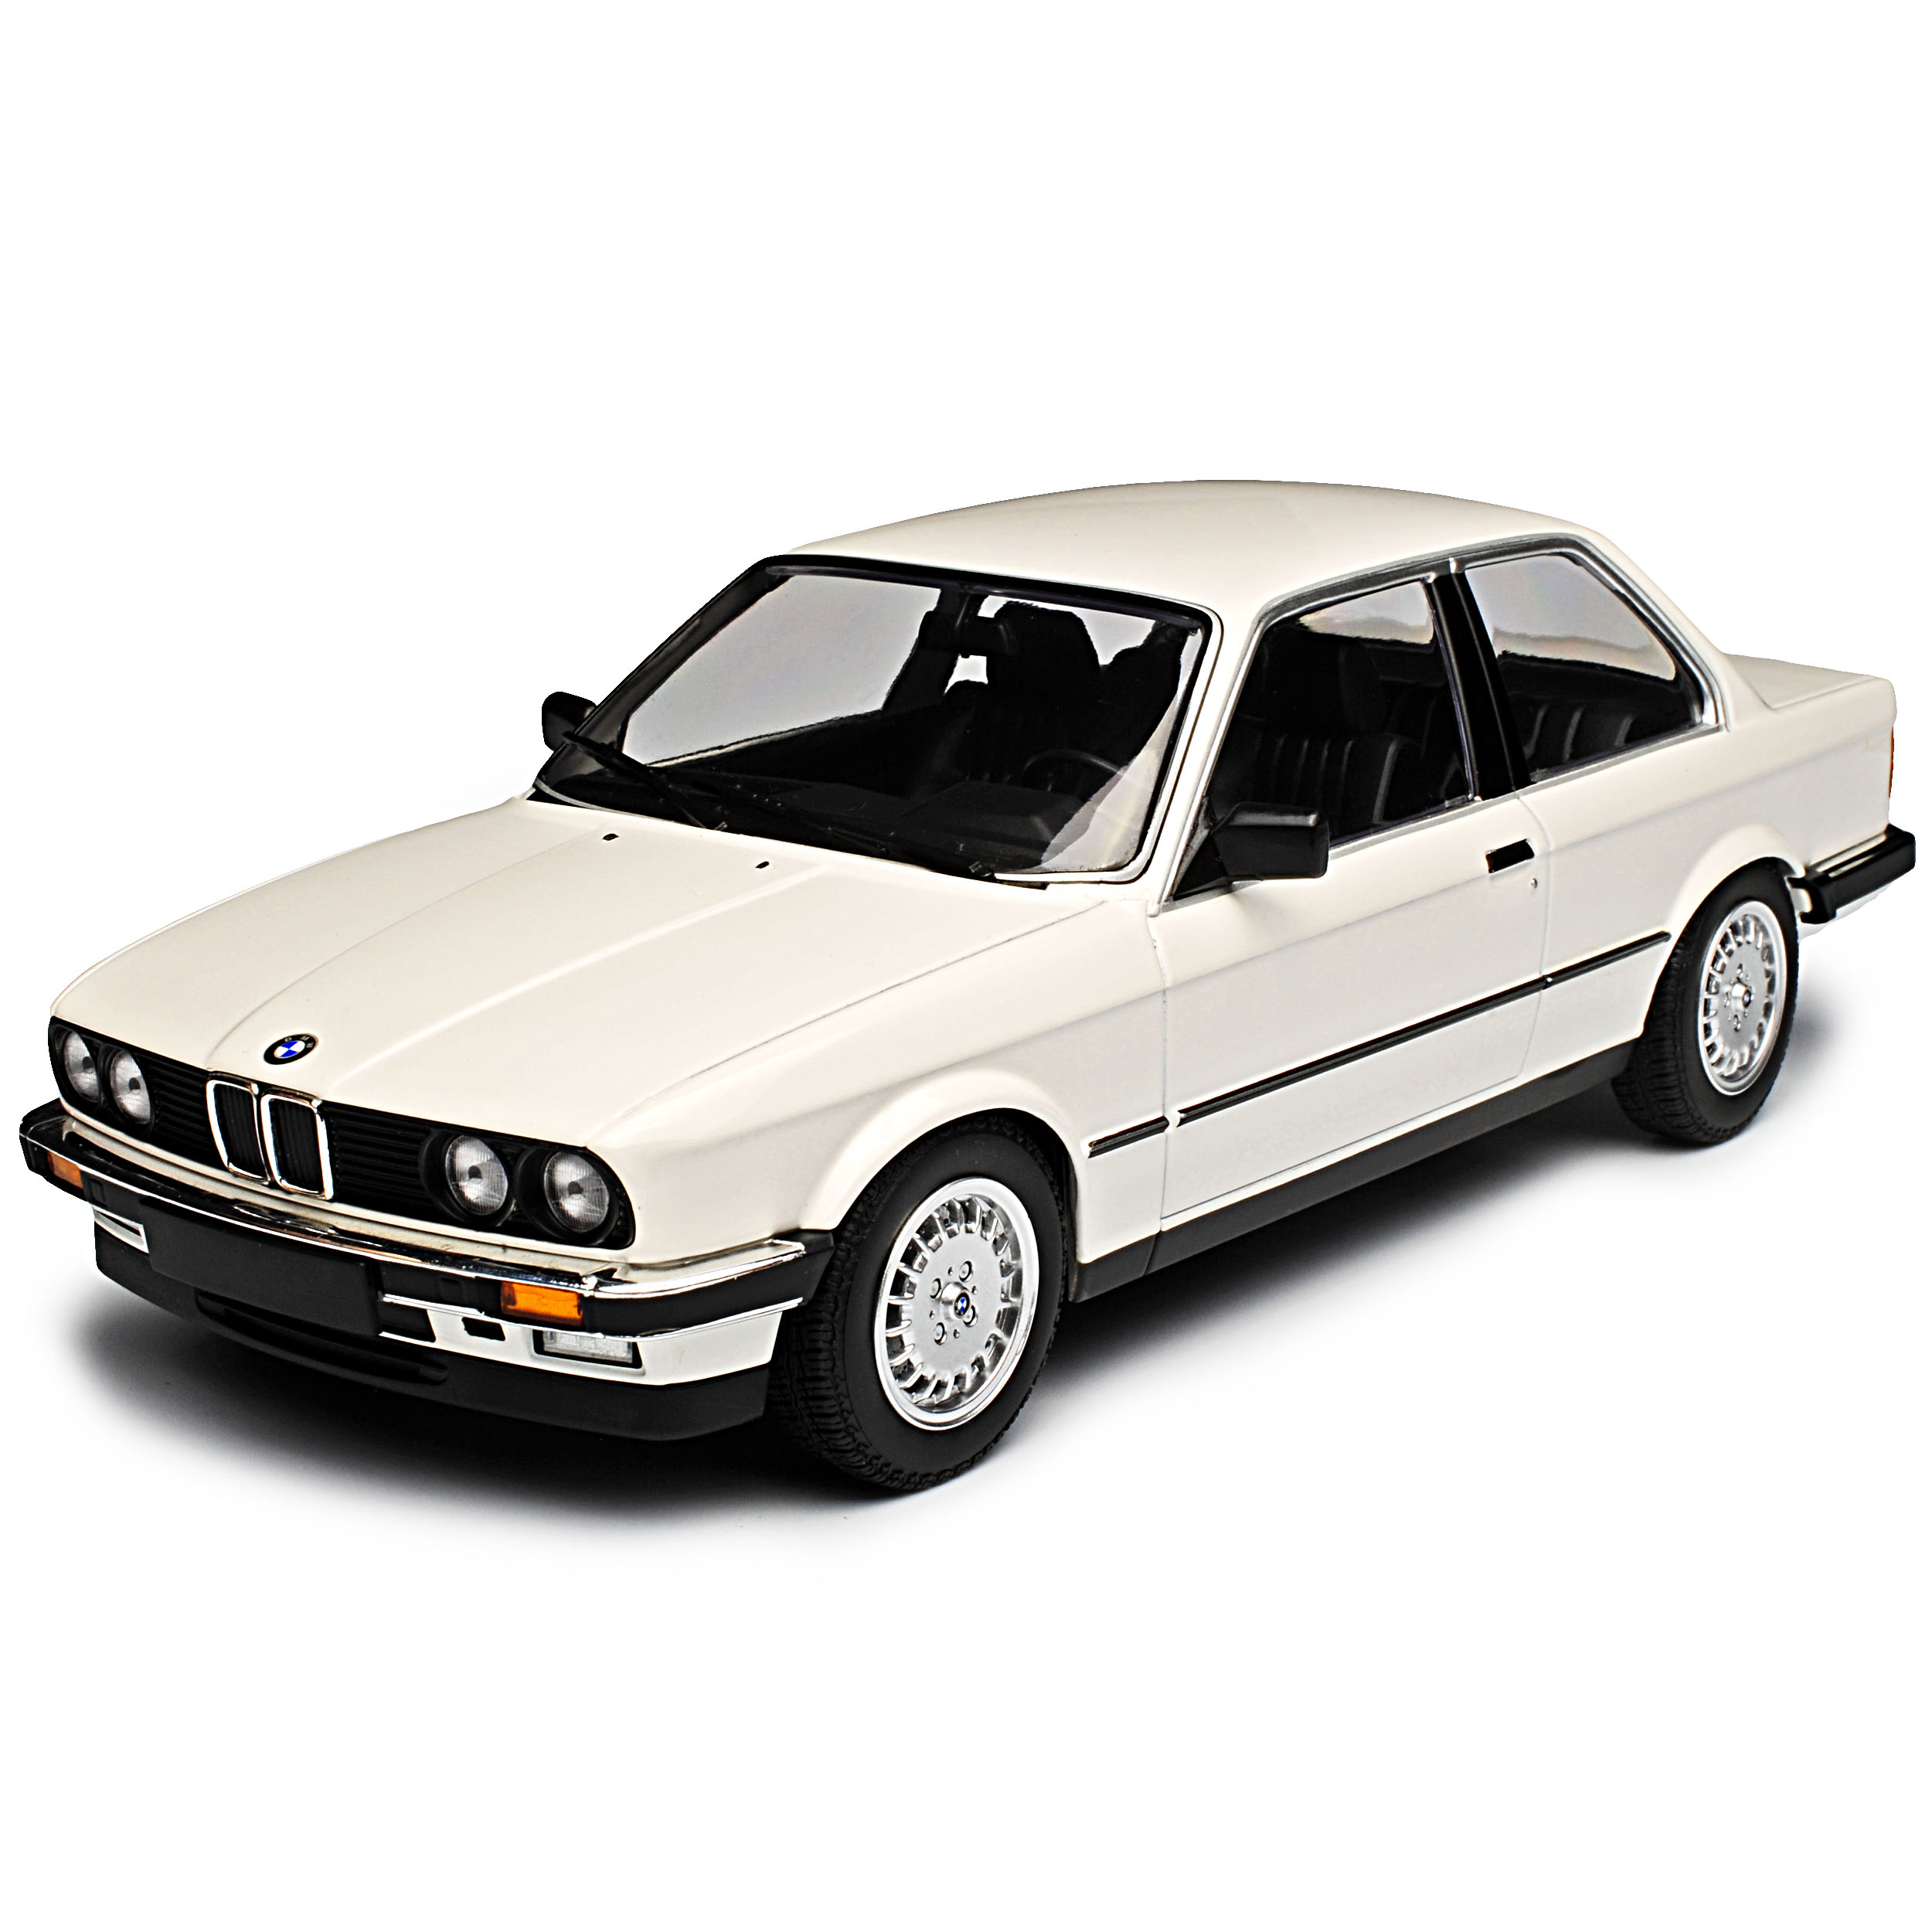 Bmw 3er E30 323i Coupe Weiss 1982